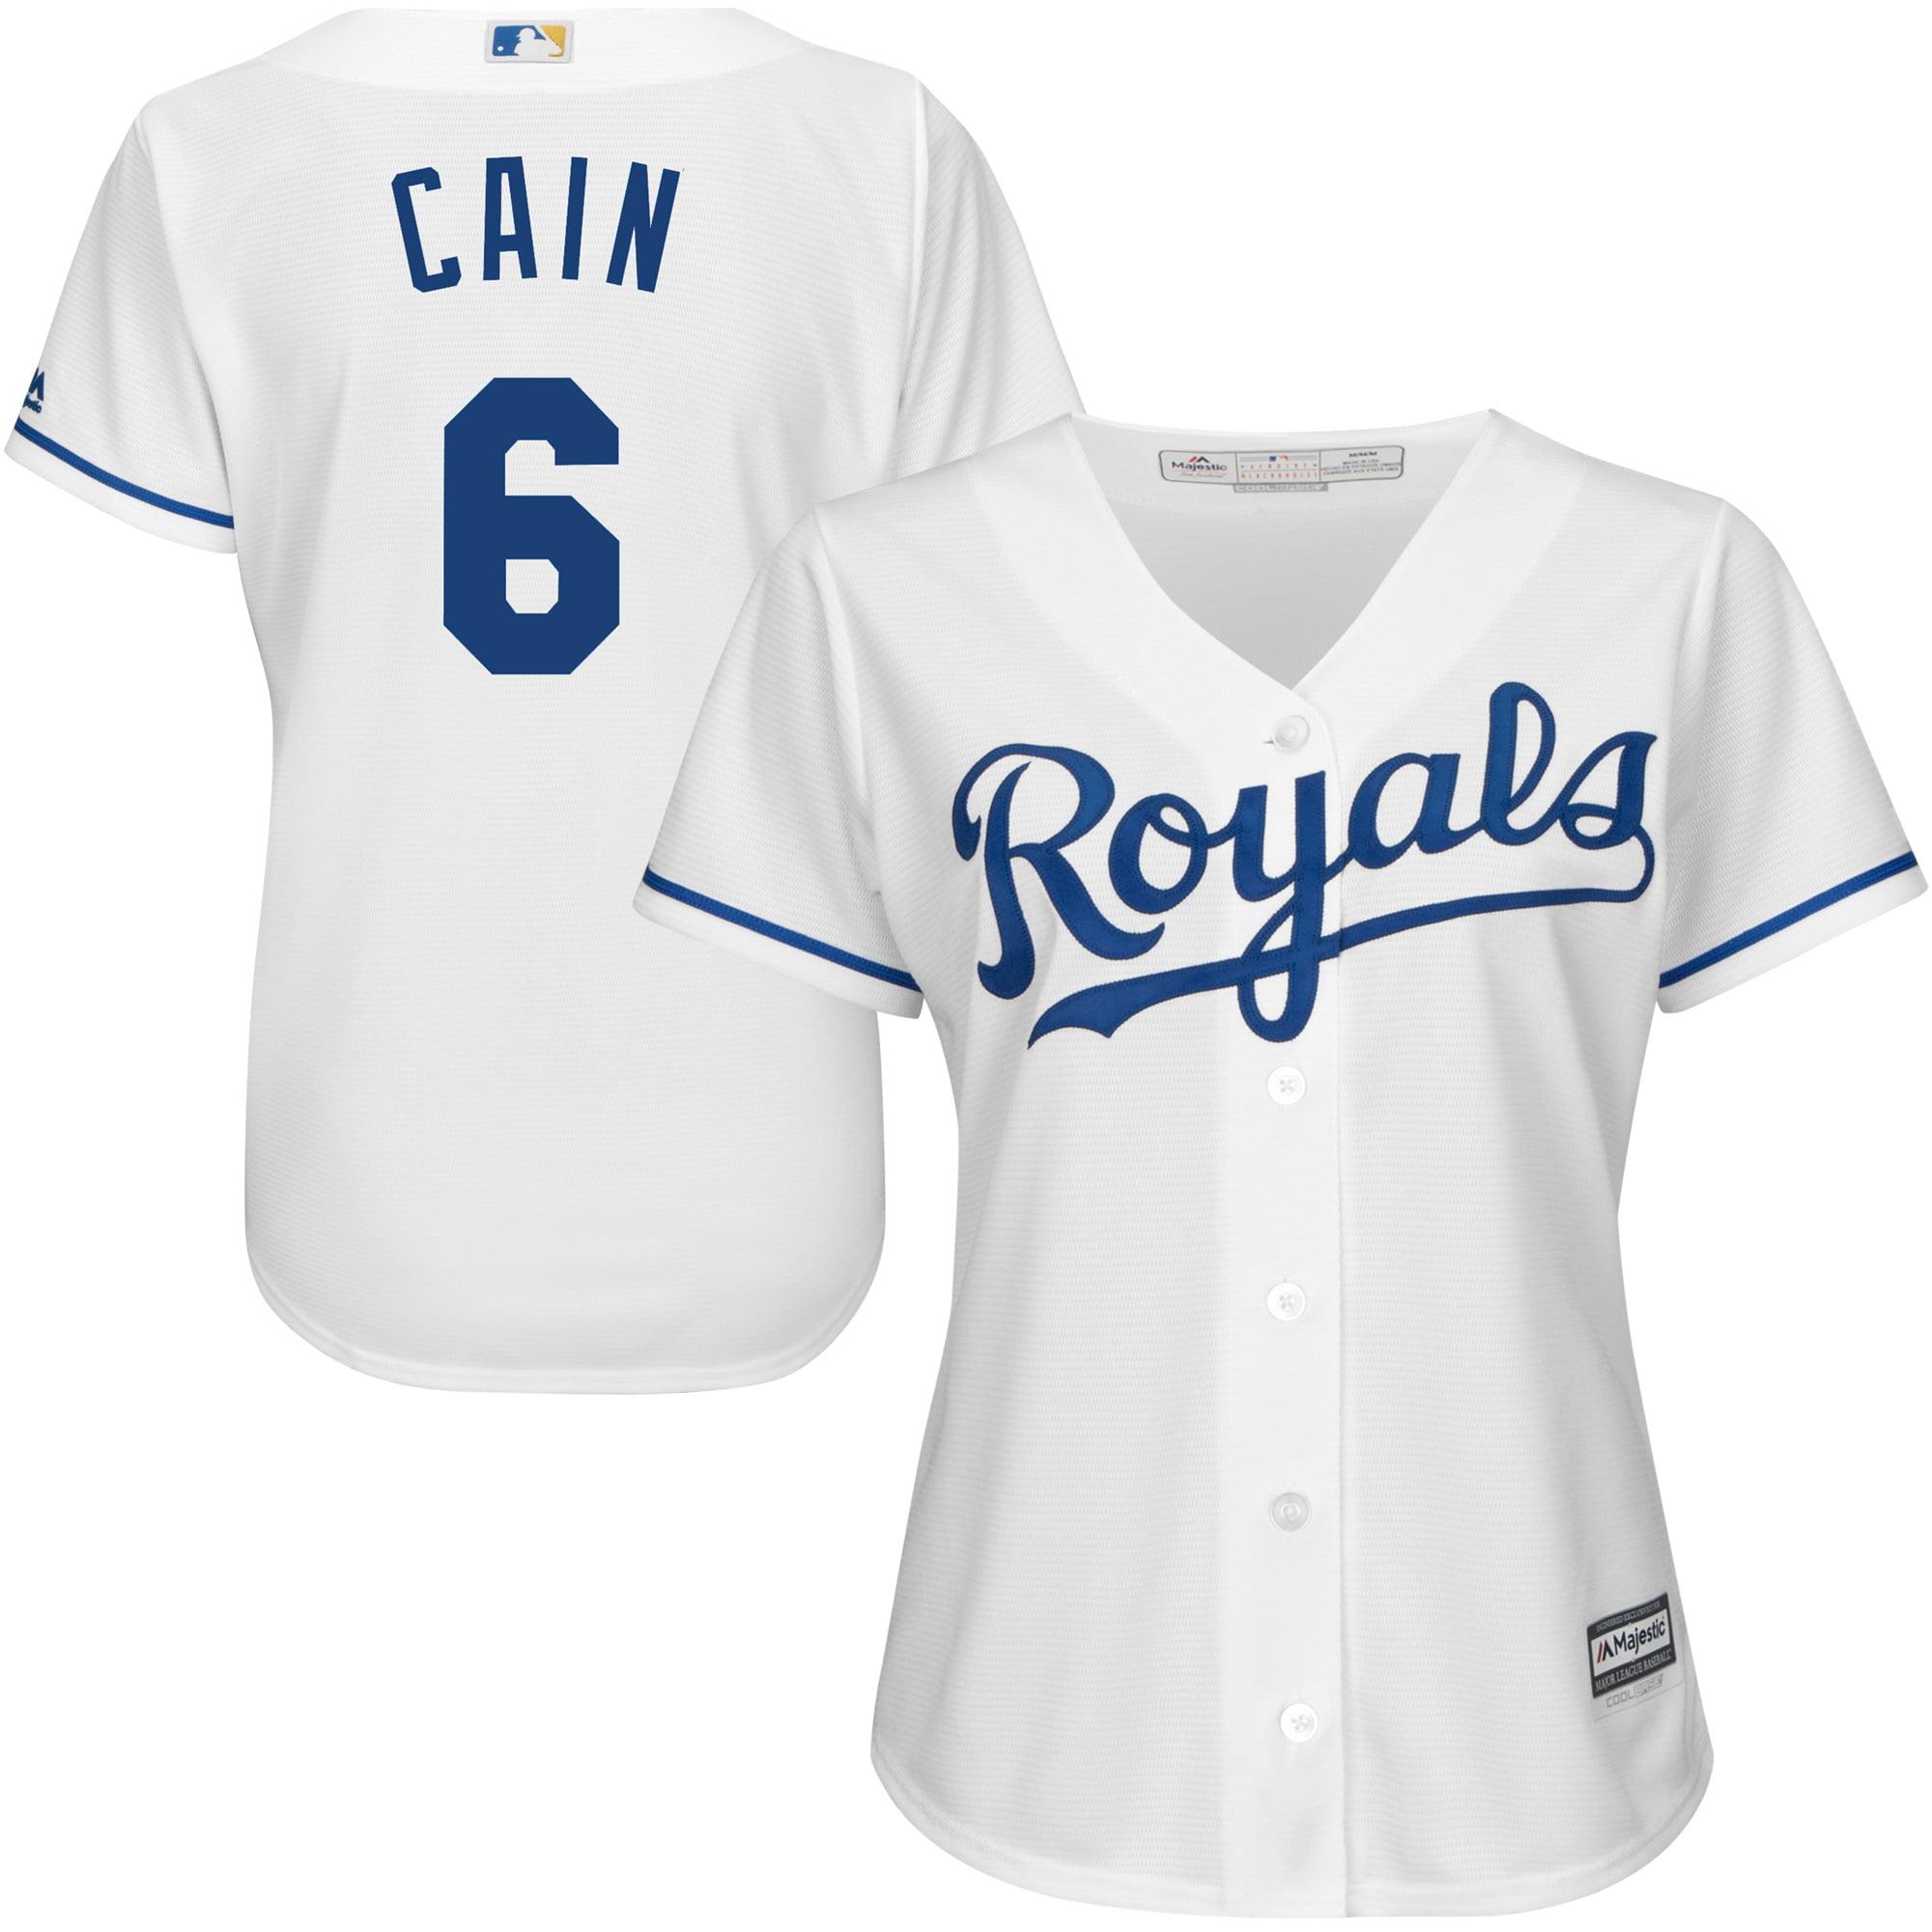 Lorenzo Cain Kansas City Royals Majestic Women's Cool Base Player Jersey White by MAJESTIC LSG